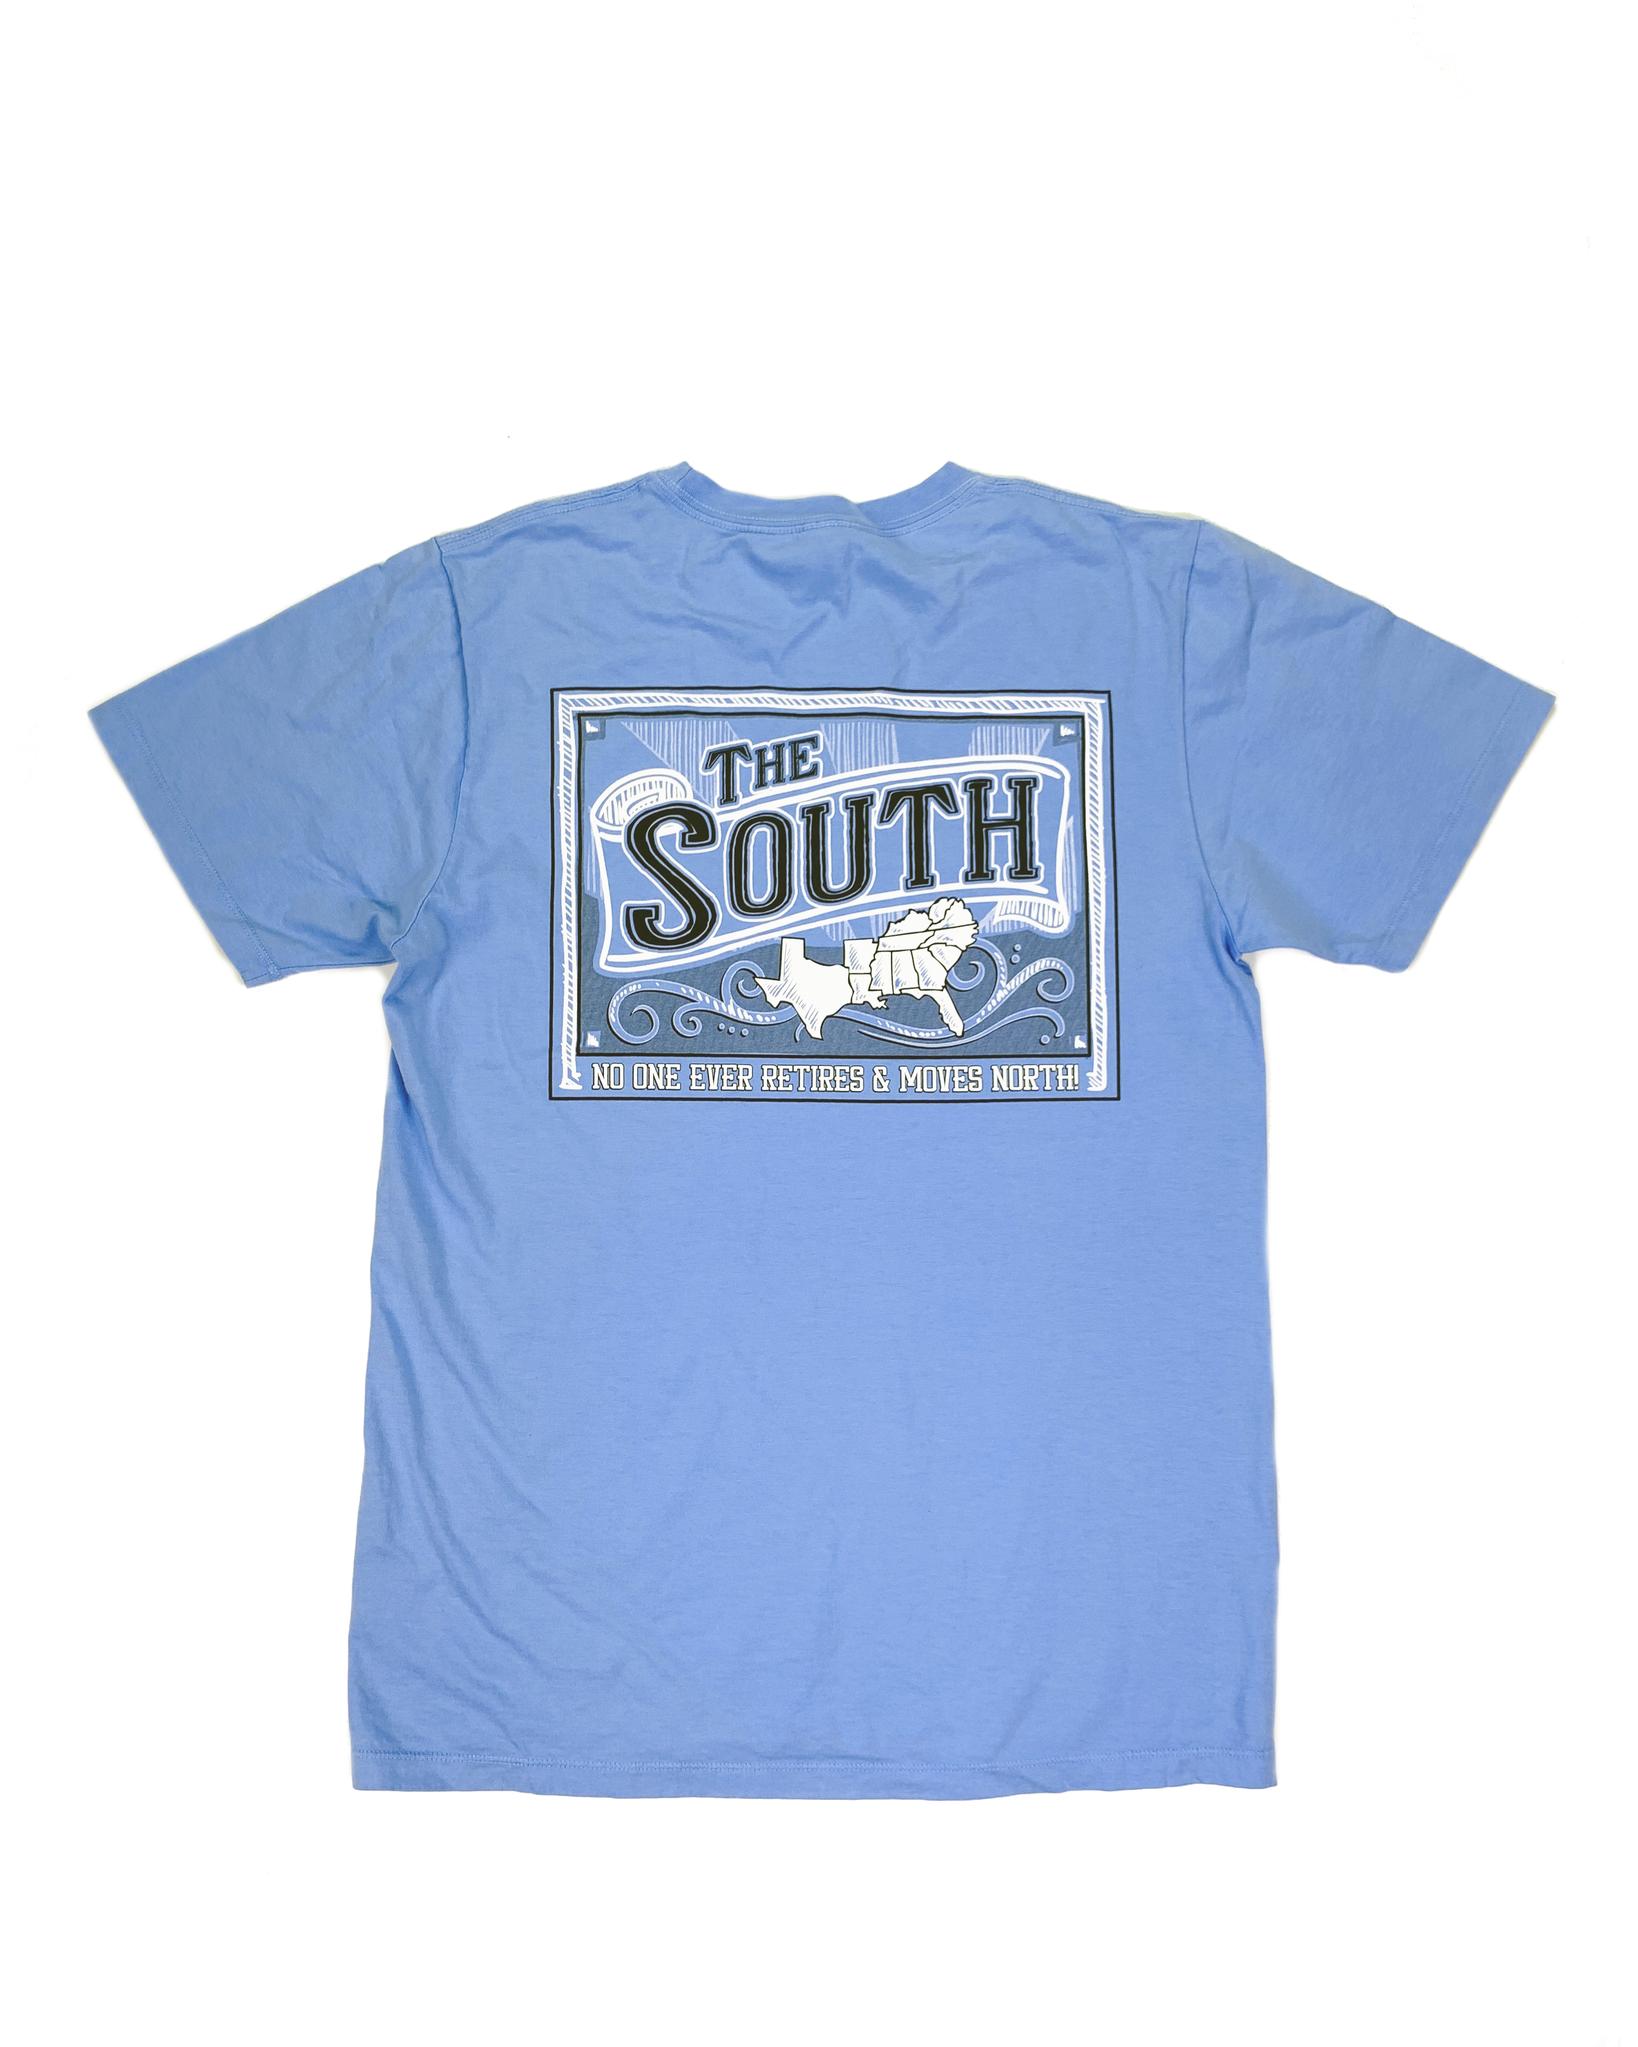 Ale Whales/Lost Wondo BHI The South Retiree Shirt